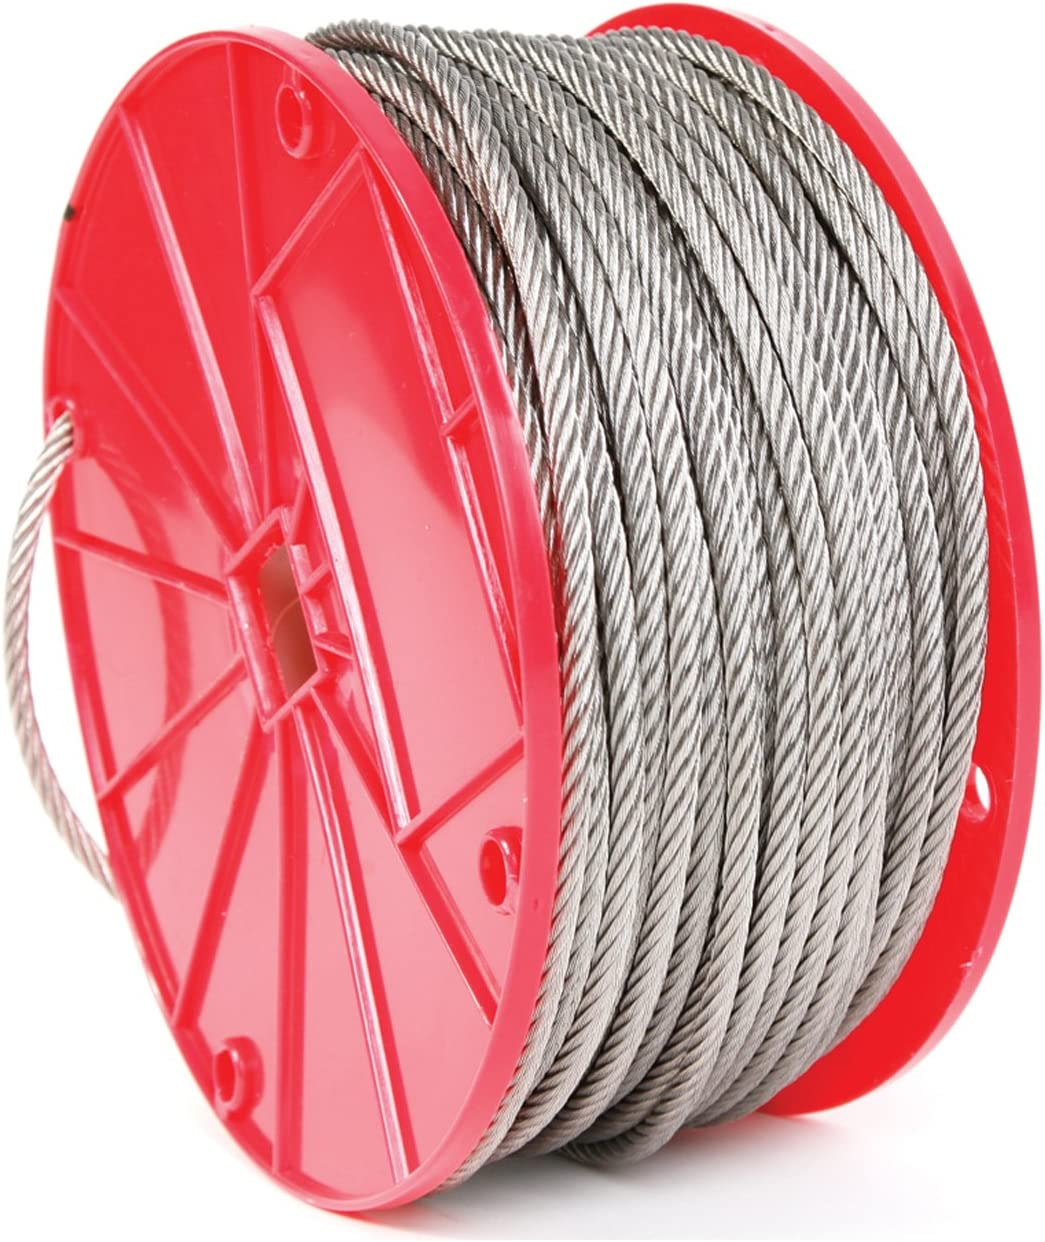 B000H5PWJM Koch Industries 016122 Koch 16122 Aircraft Cable, 1/8 in Dia X 250 Ft L, 350 Lb 813tzeQfYqL